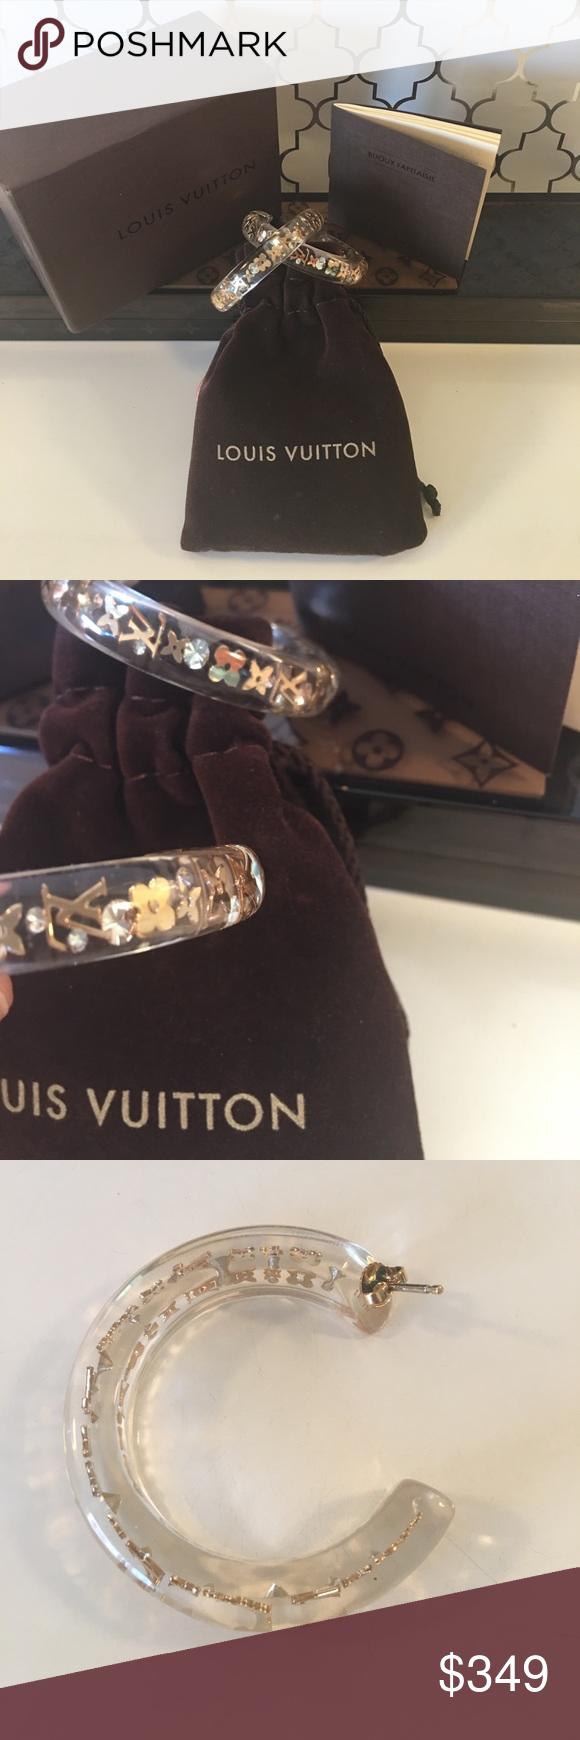 ⭐️LOUIS VUITTON LARGE HOOP EARRINGS 💯AUTHENTIC LOUIS ...